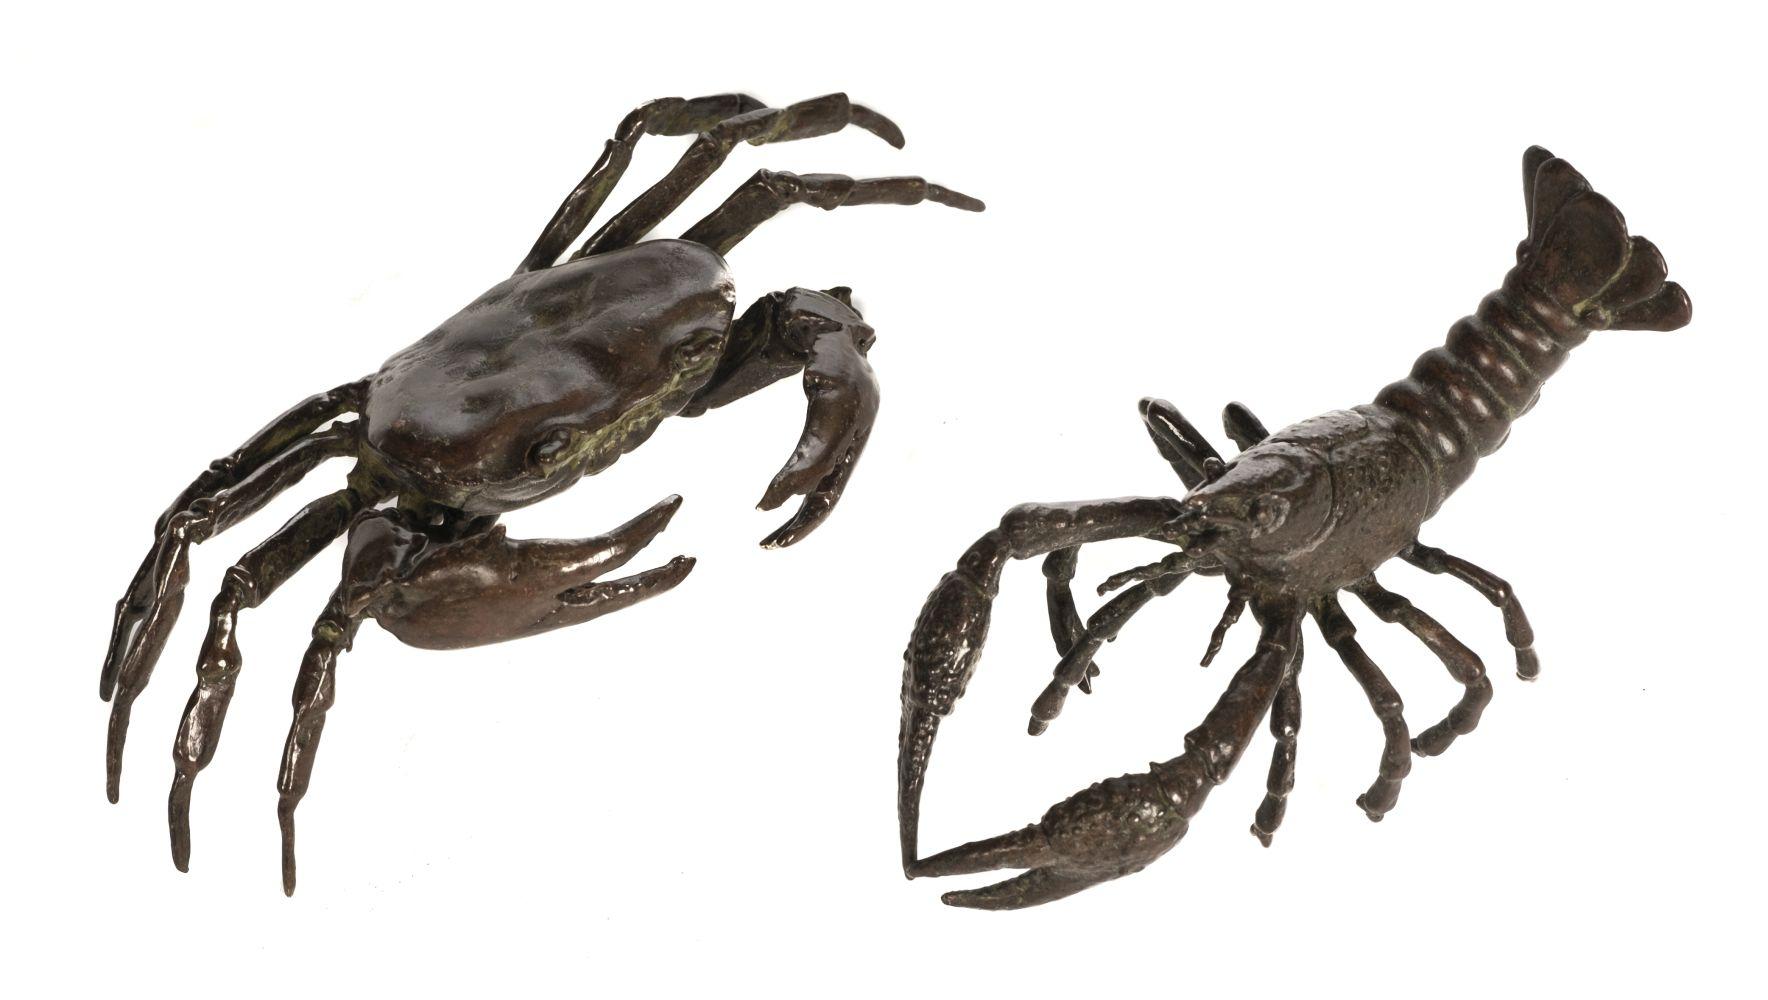 * Bronzes. Japanese bronze crab and lobster, Meiji period